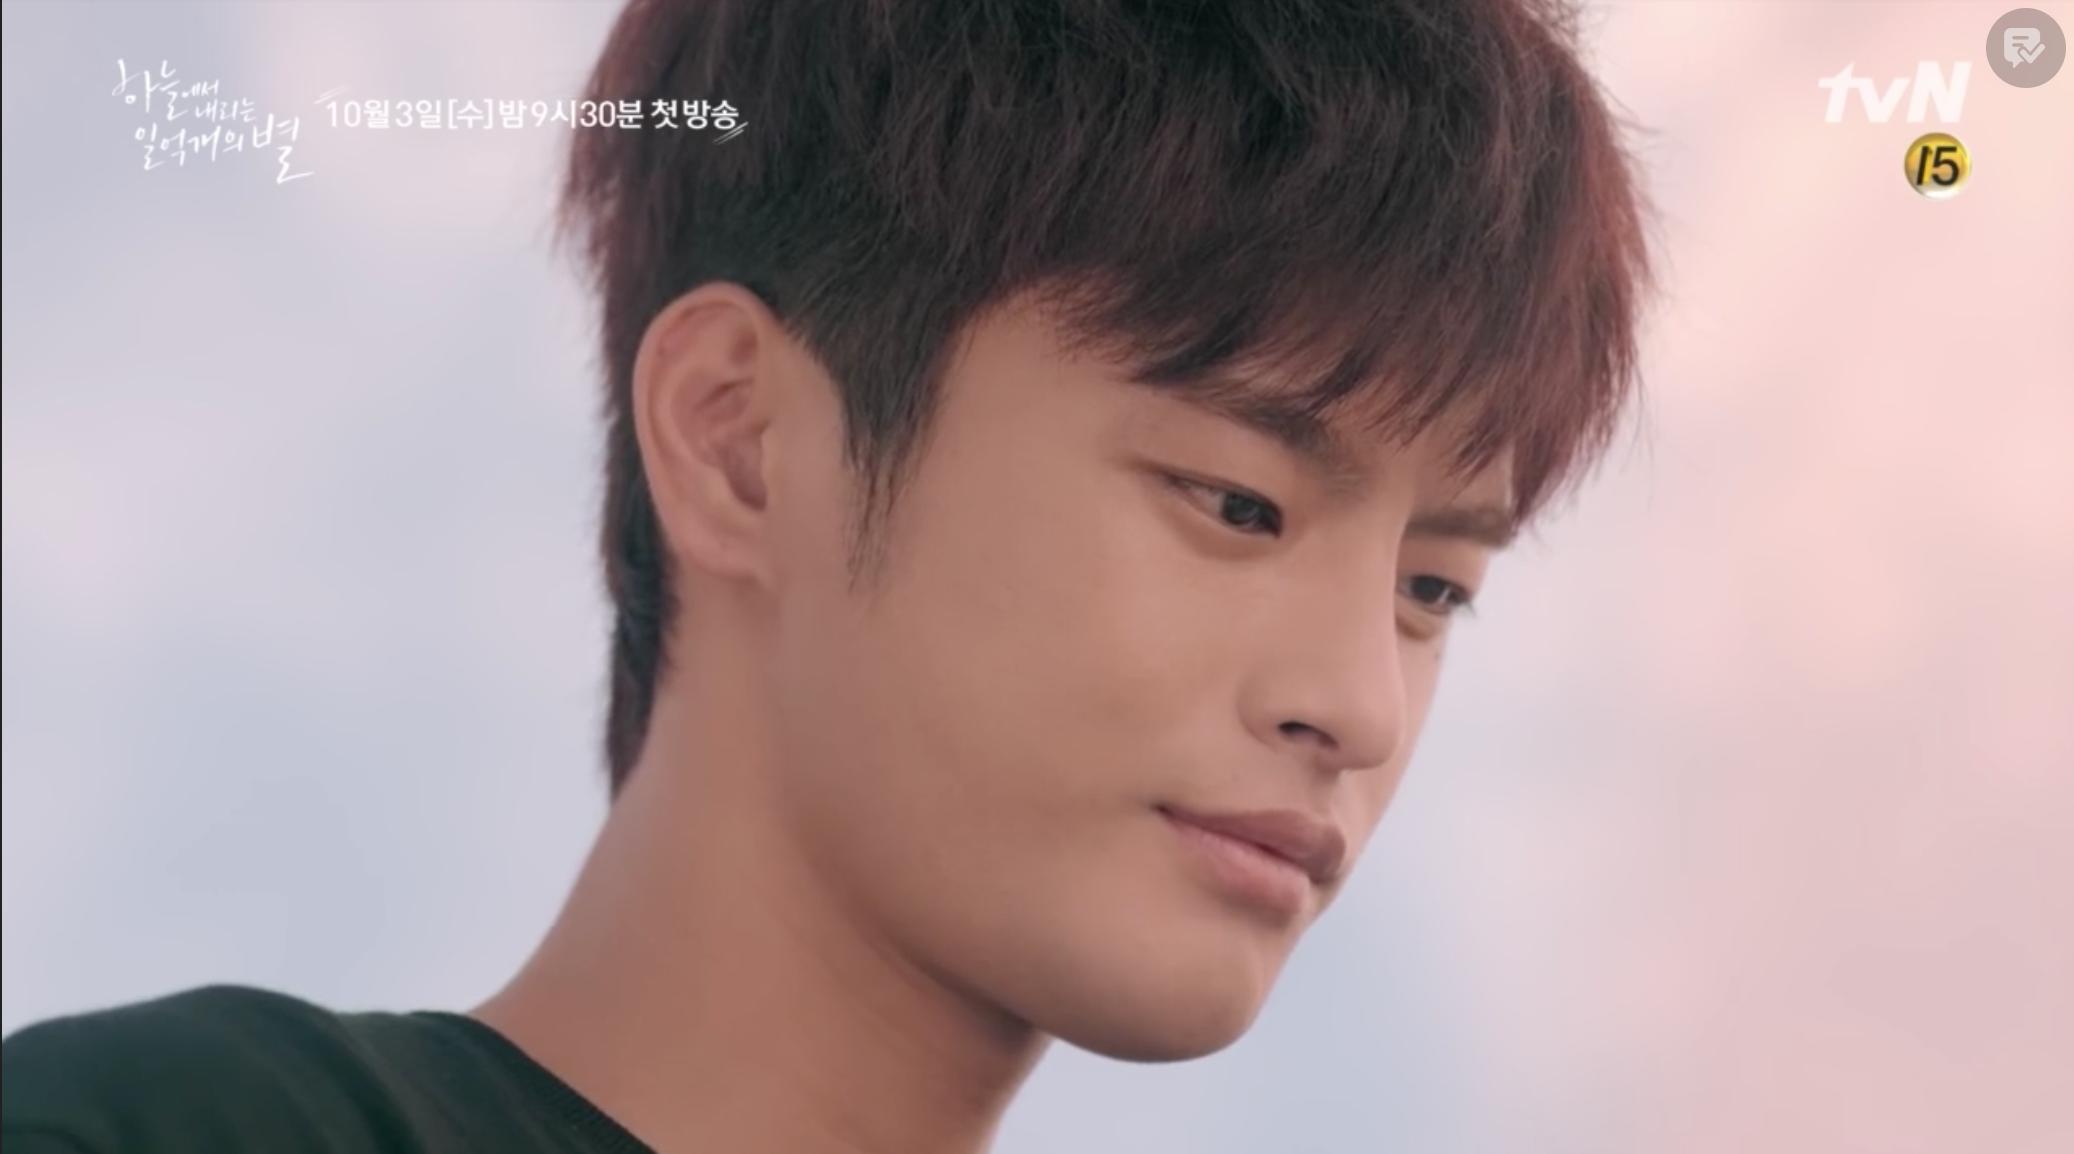 Character Teaser 1 - Seo In Guk: La sonrisa se ha ido de tus ojos